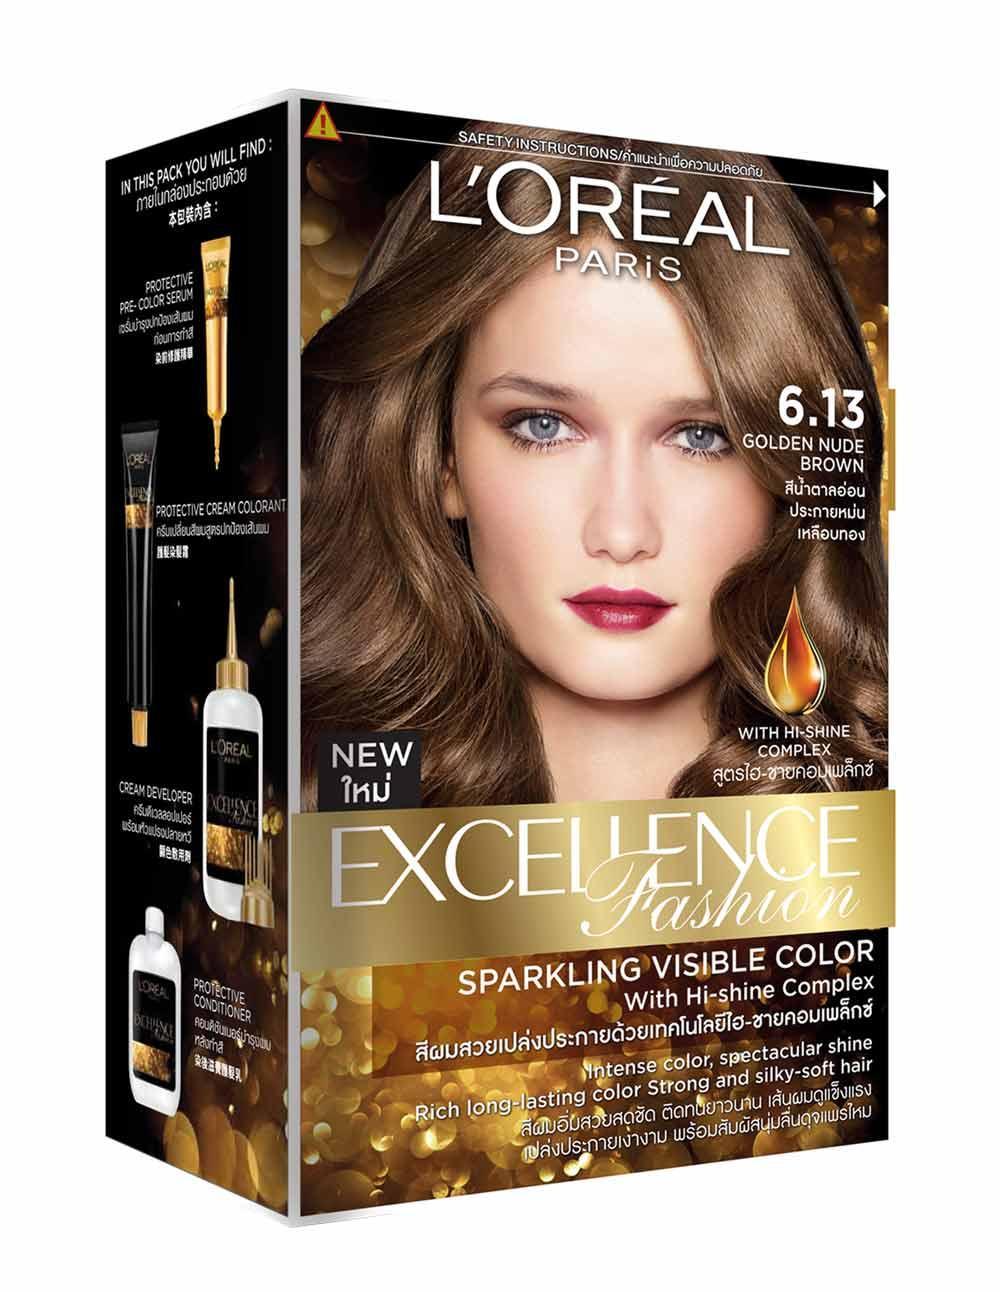 Cat Rambut Permanent Temporary Hair Chalk Kapur Pewarna 24 Warna Temporer Loreal Paris Excellence Fashion 613 Golden Nude